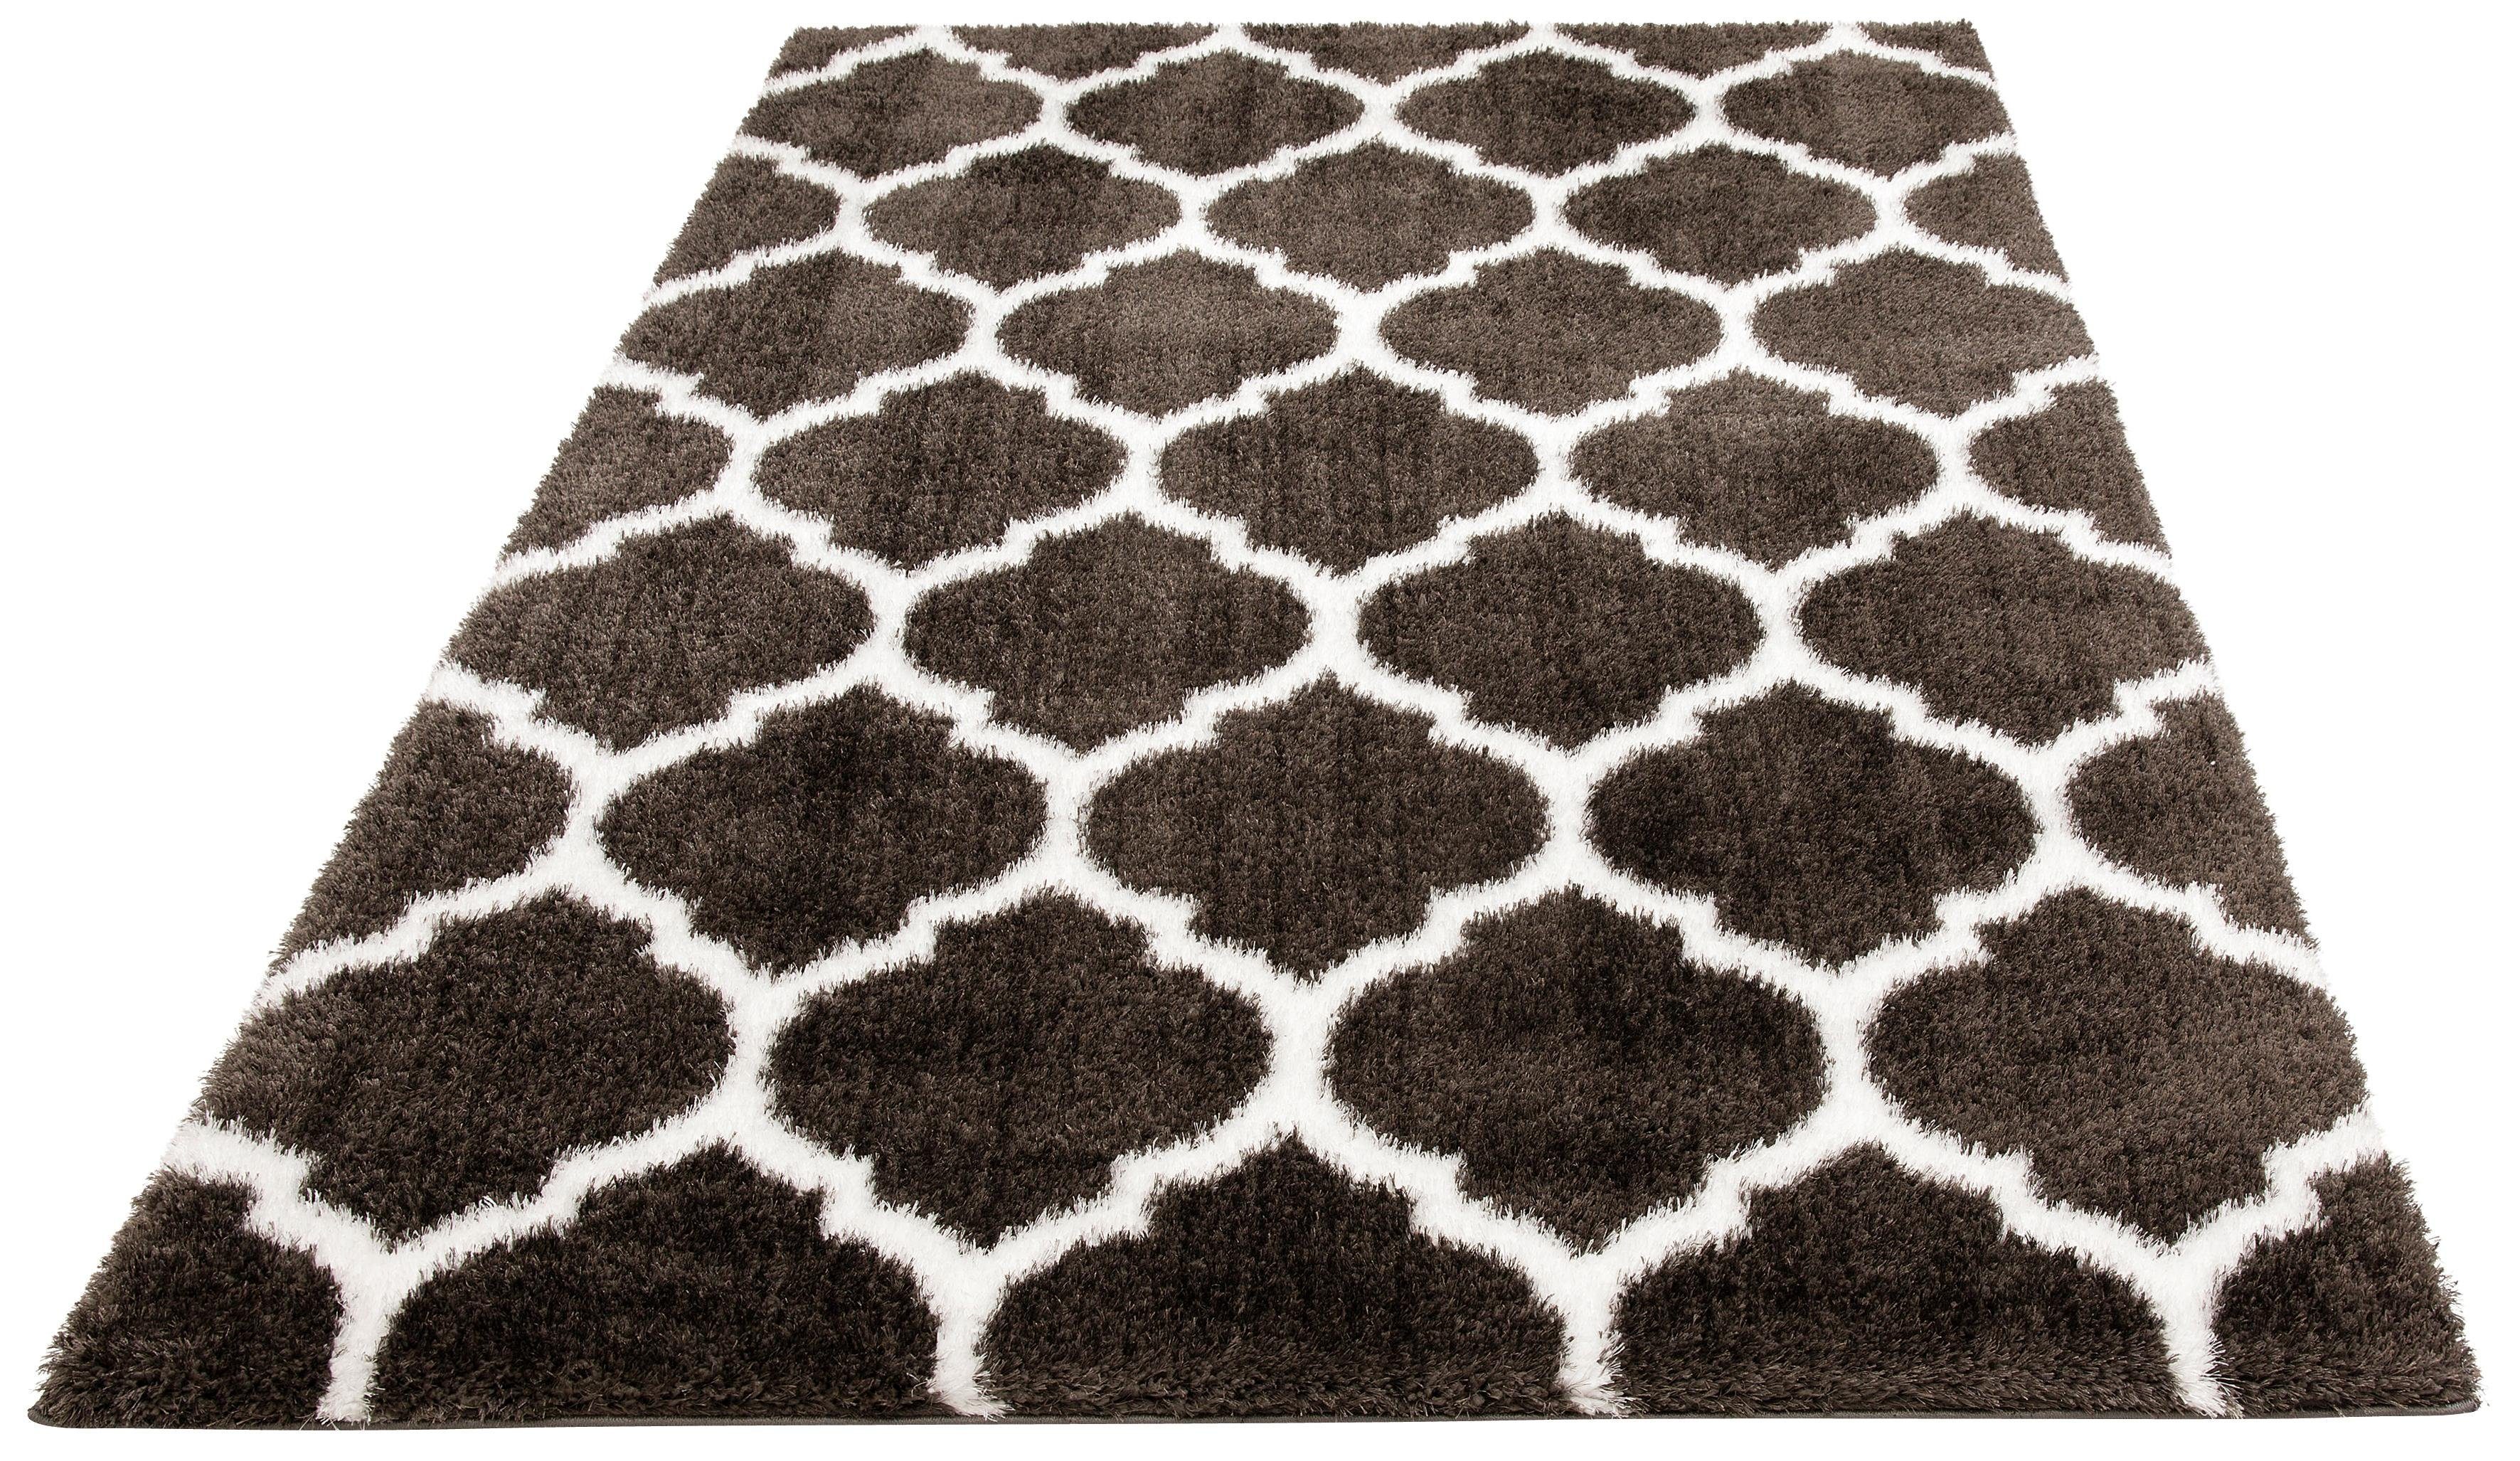 Hochflor-Teppich Soraya Leonique rechteckig Höhe 40 mm maschinell gewebt